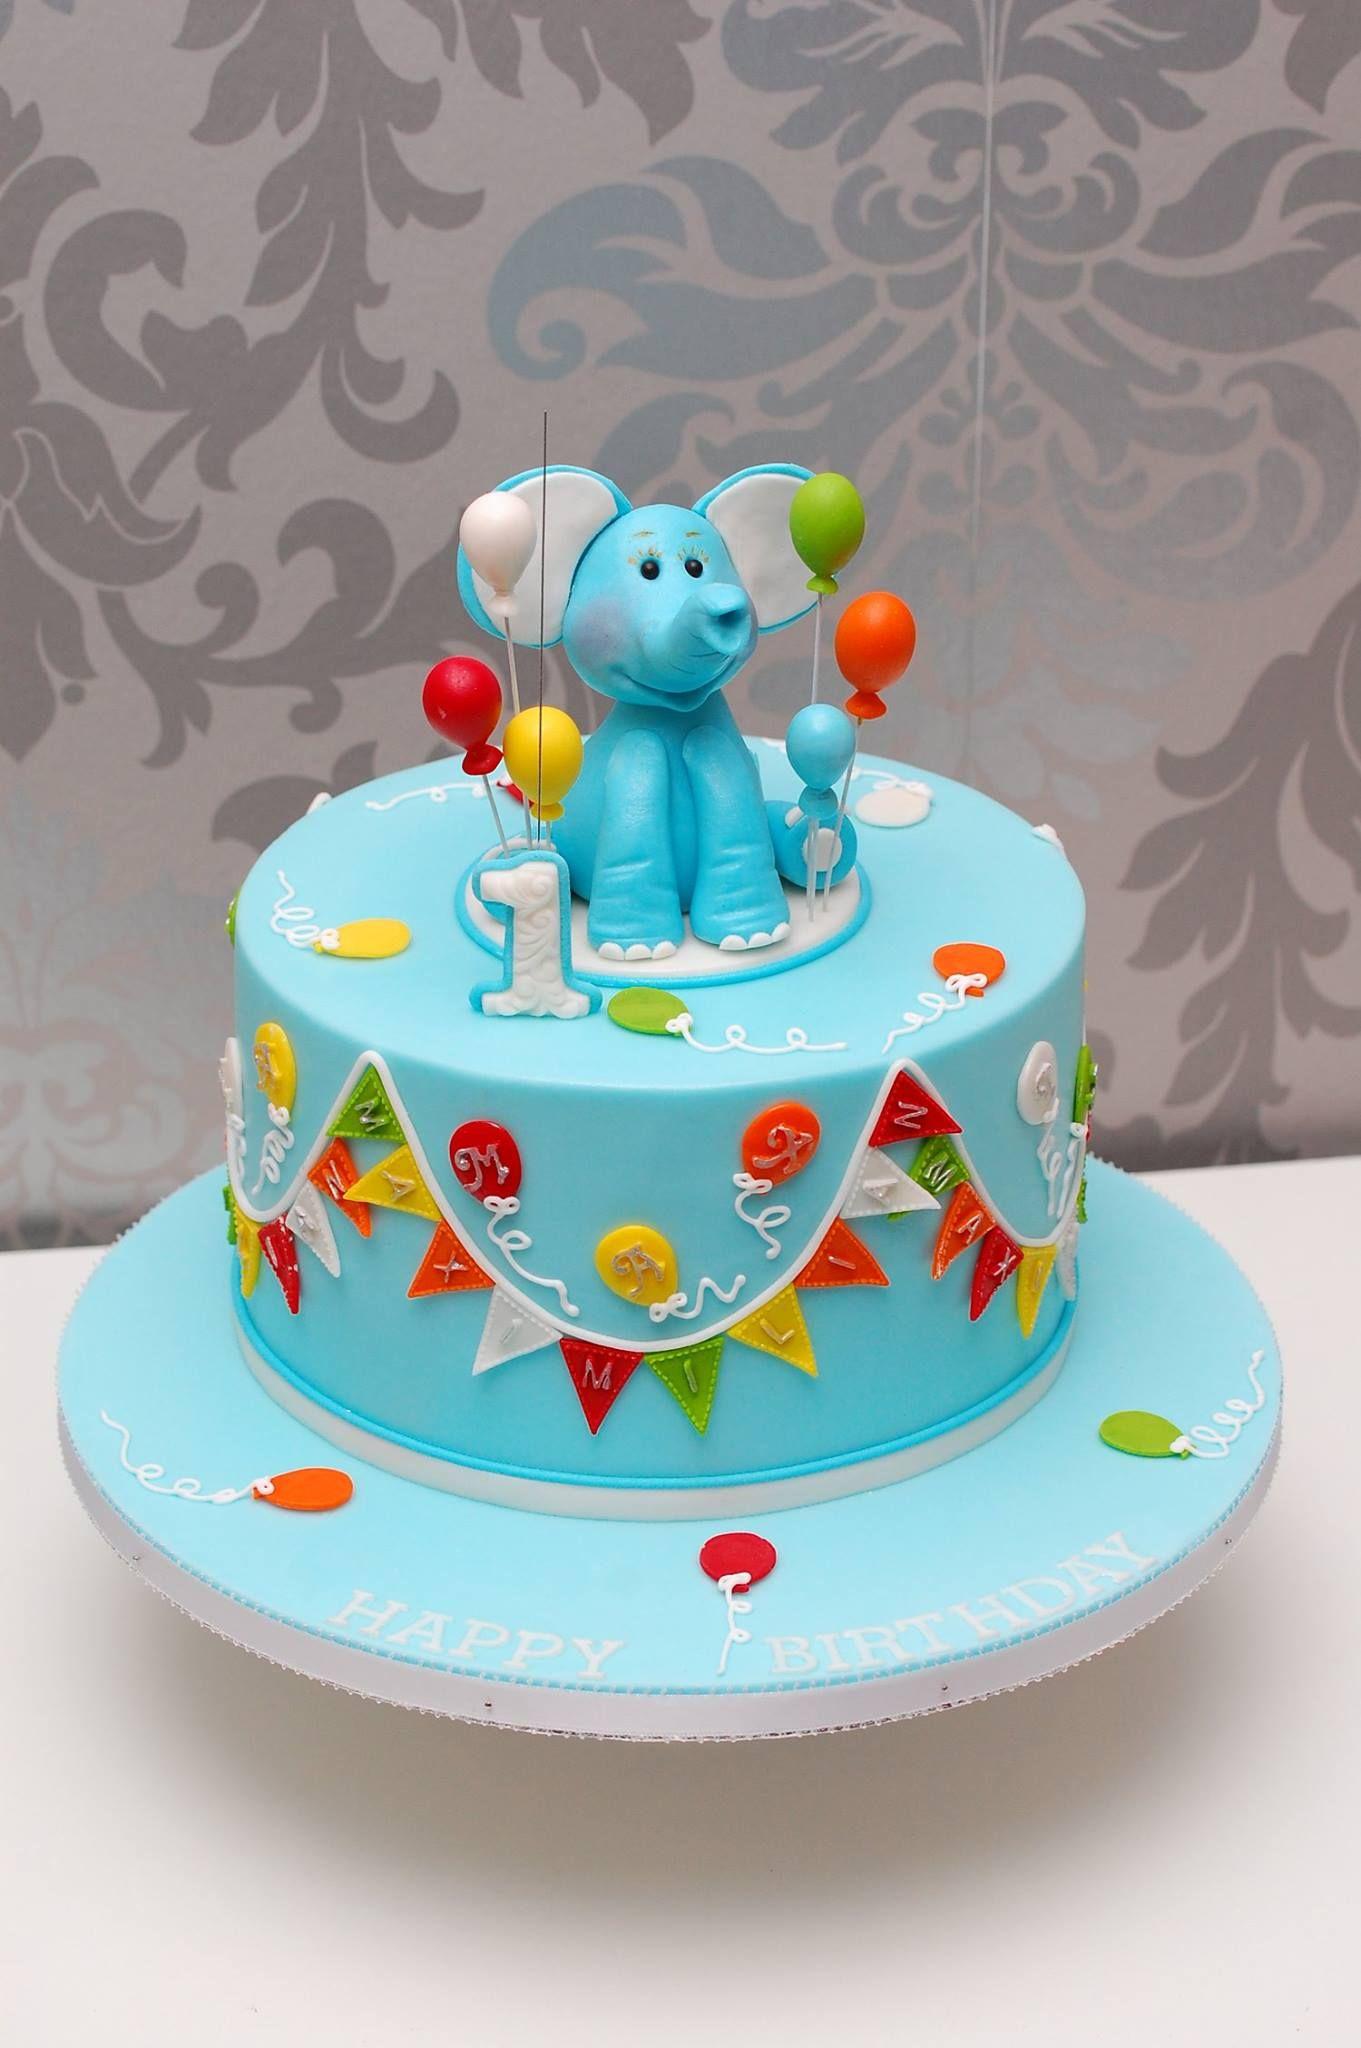 kinder-geburtstagstorte-elefant | Torte kindergeburtstag ...